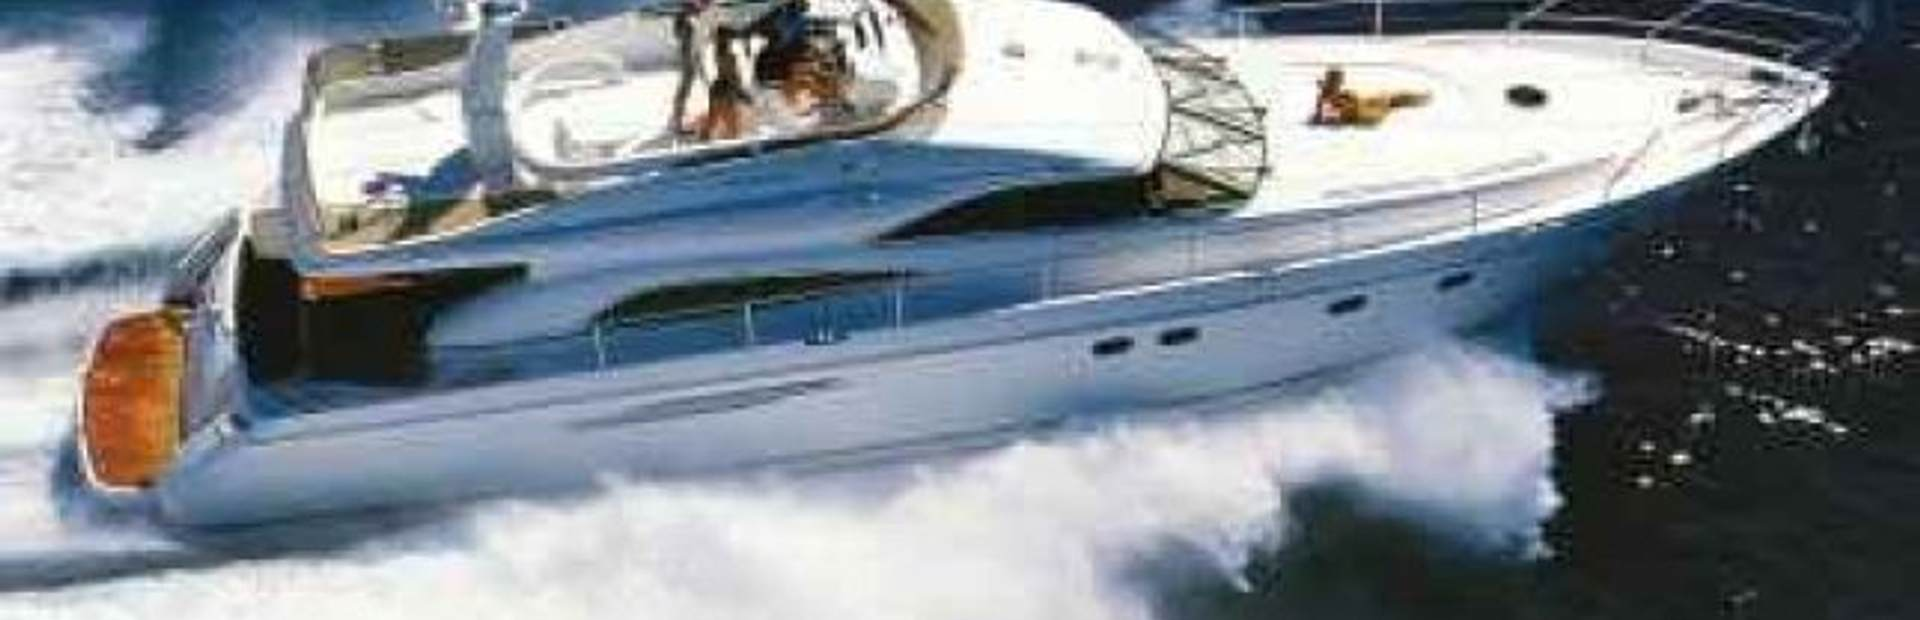 Princess 65 Yacht Charter